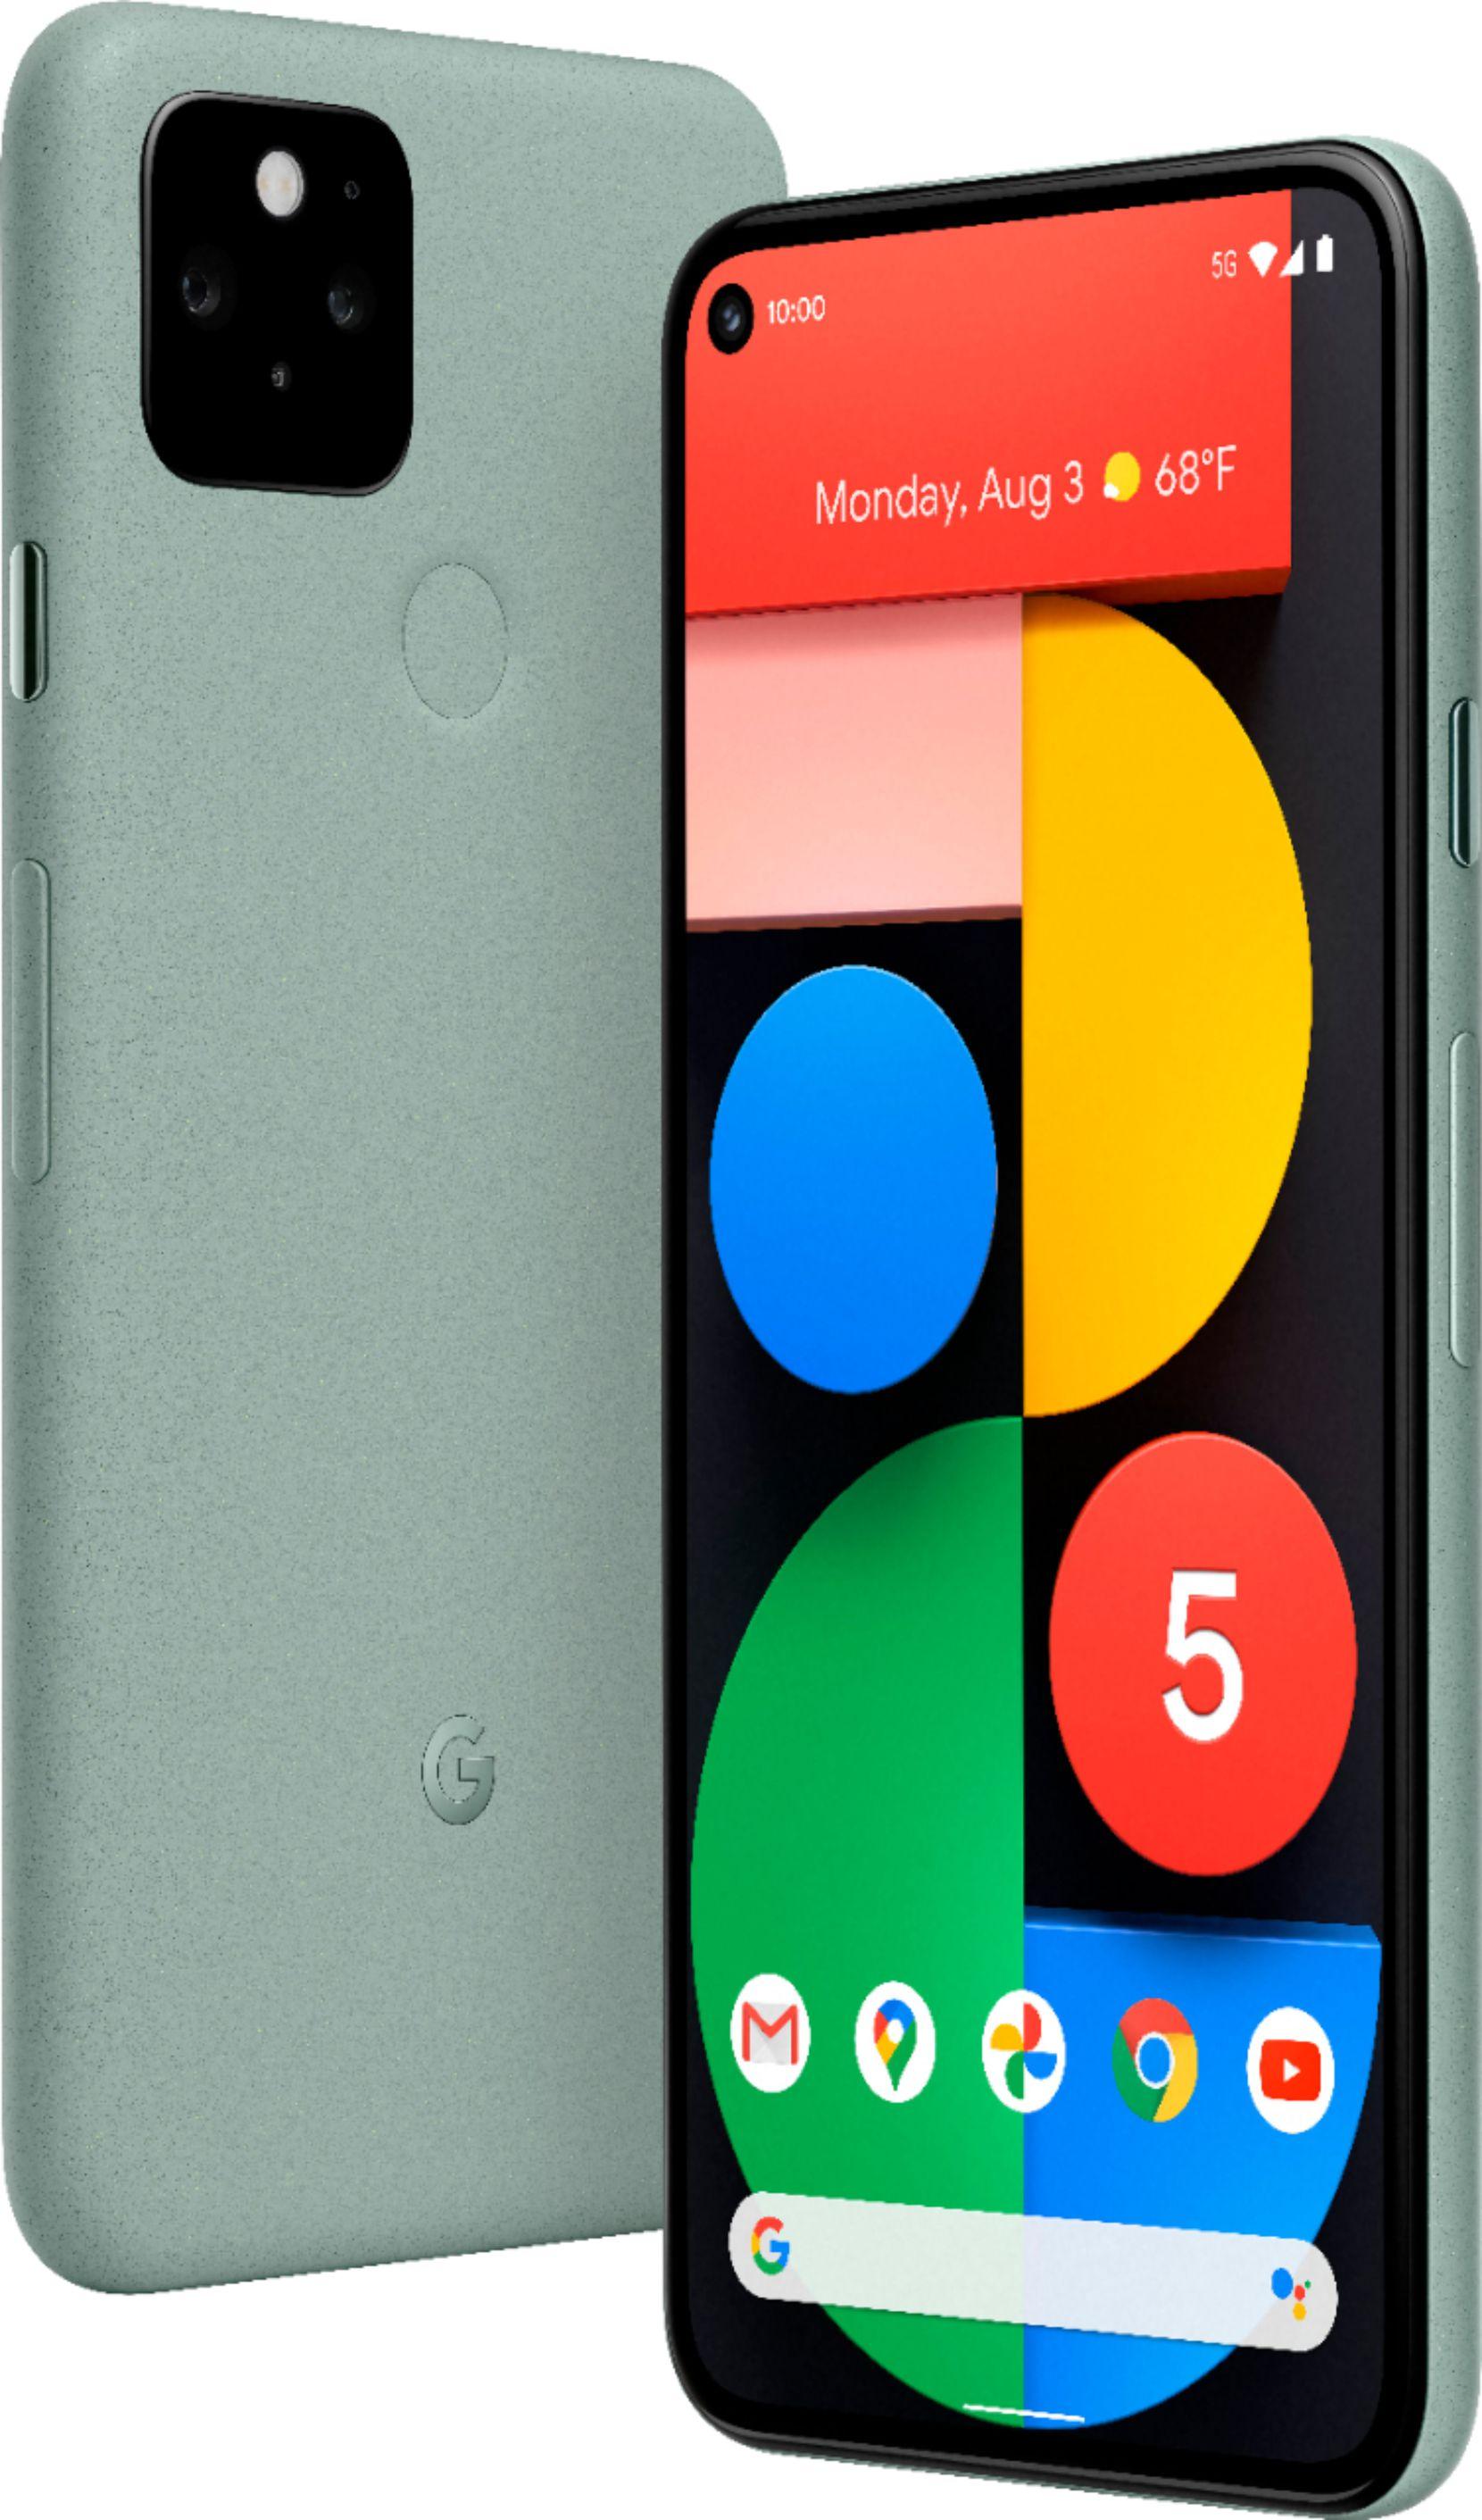 The Google Pixel 5 5G.